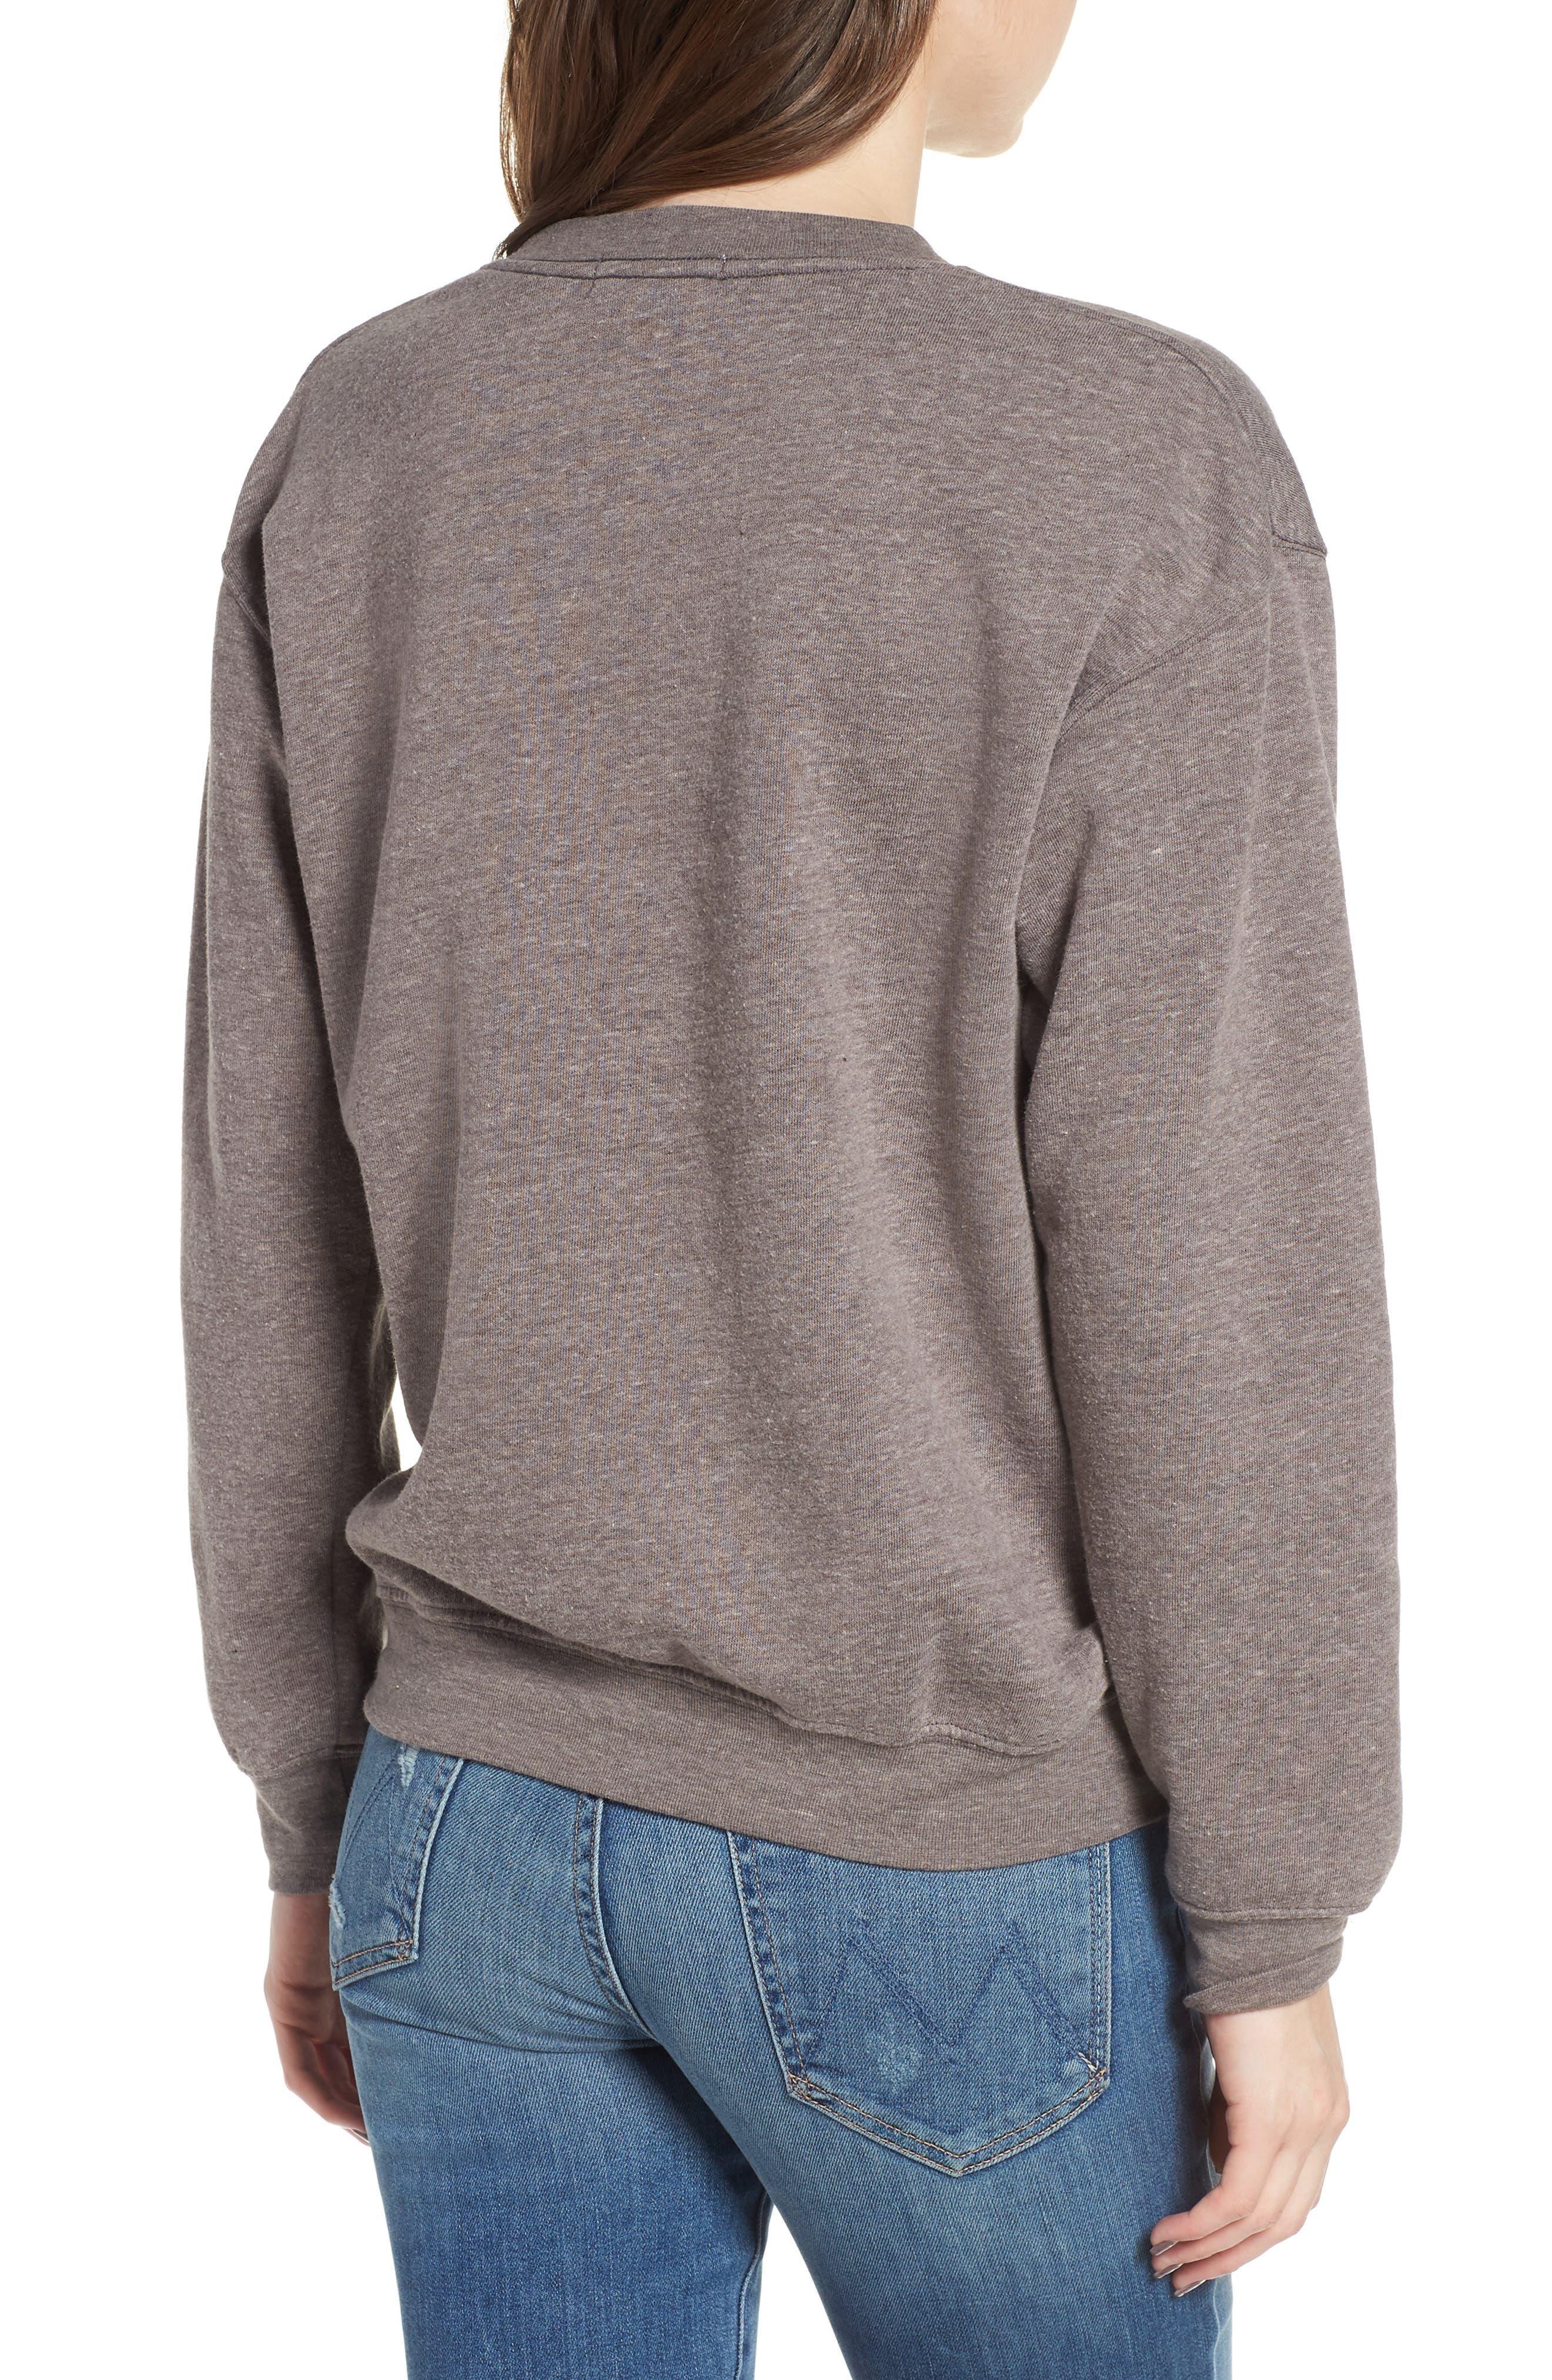 Golden Girls Willow Sweatshirt,                             Alternate thumbnail 2, color,                             Heather Grey